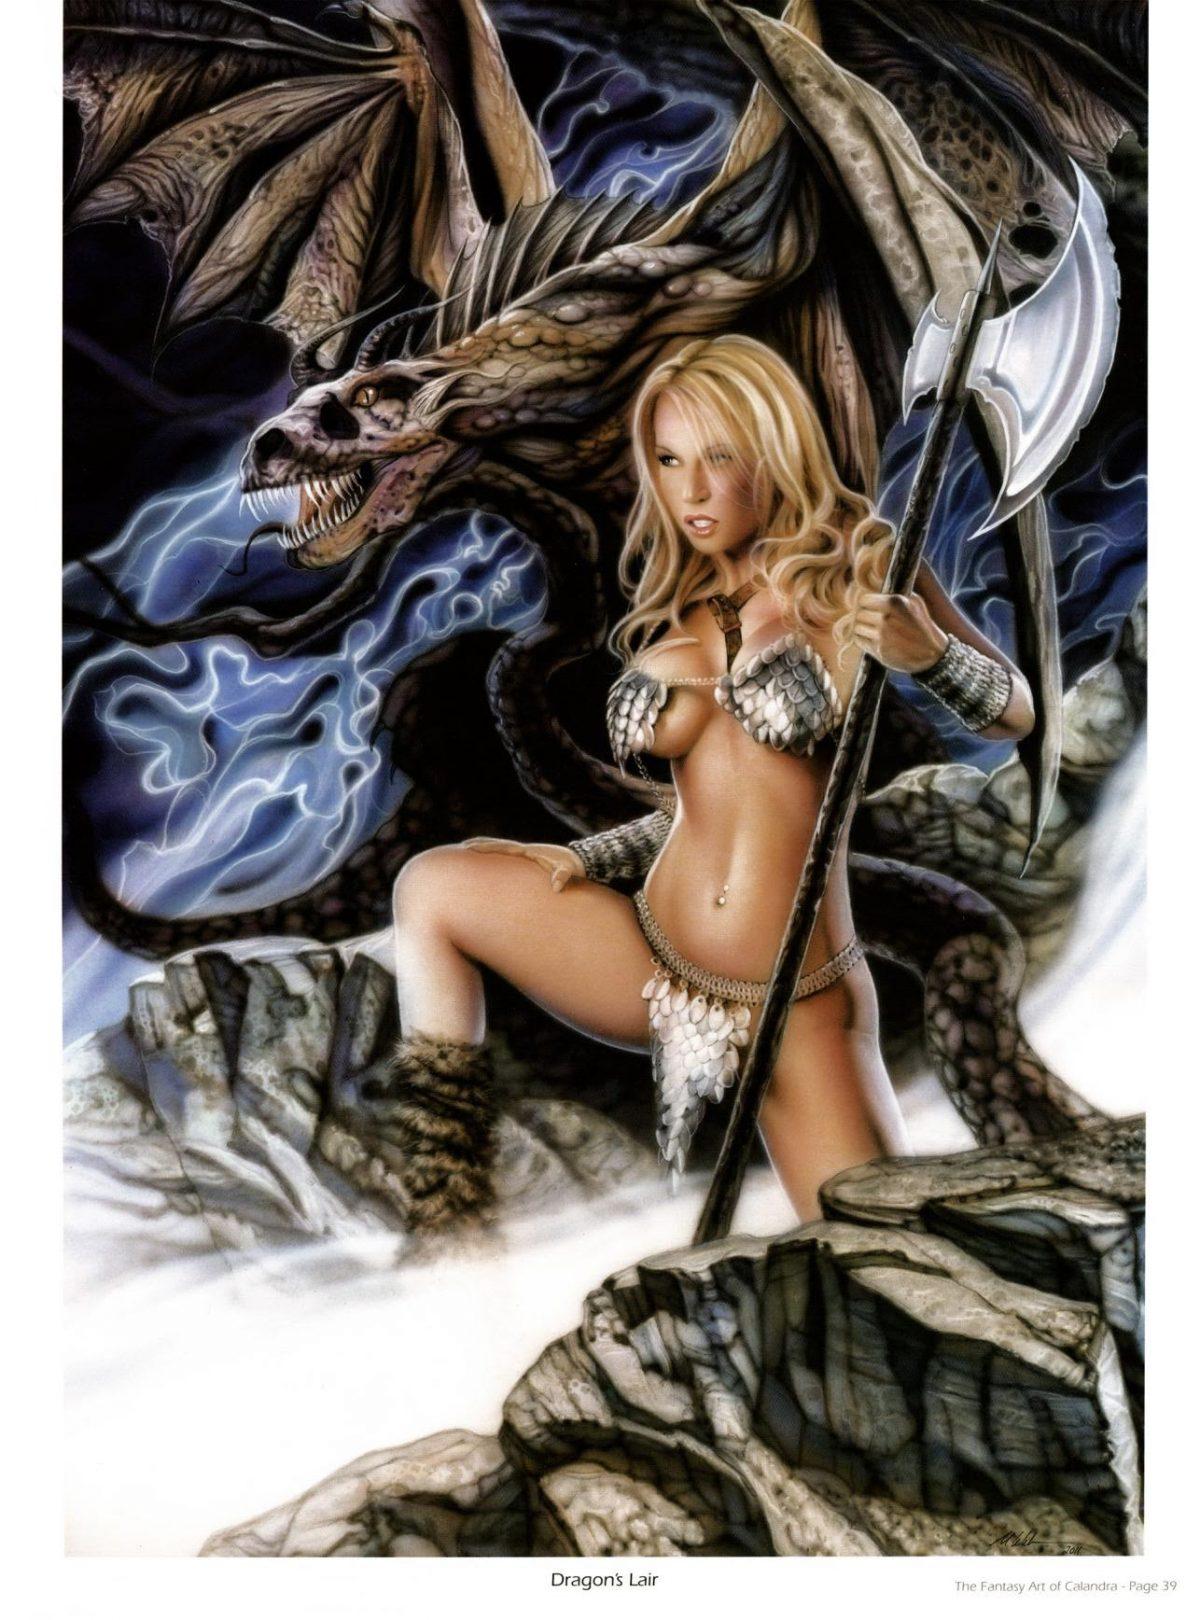 Dragon's Lair by Michael Calandra